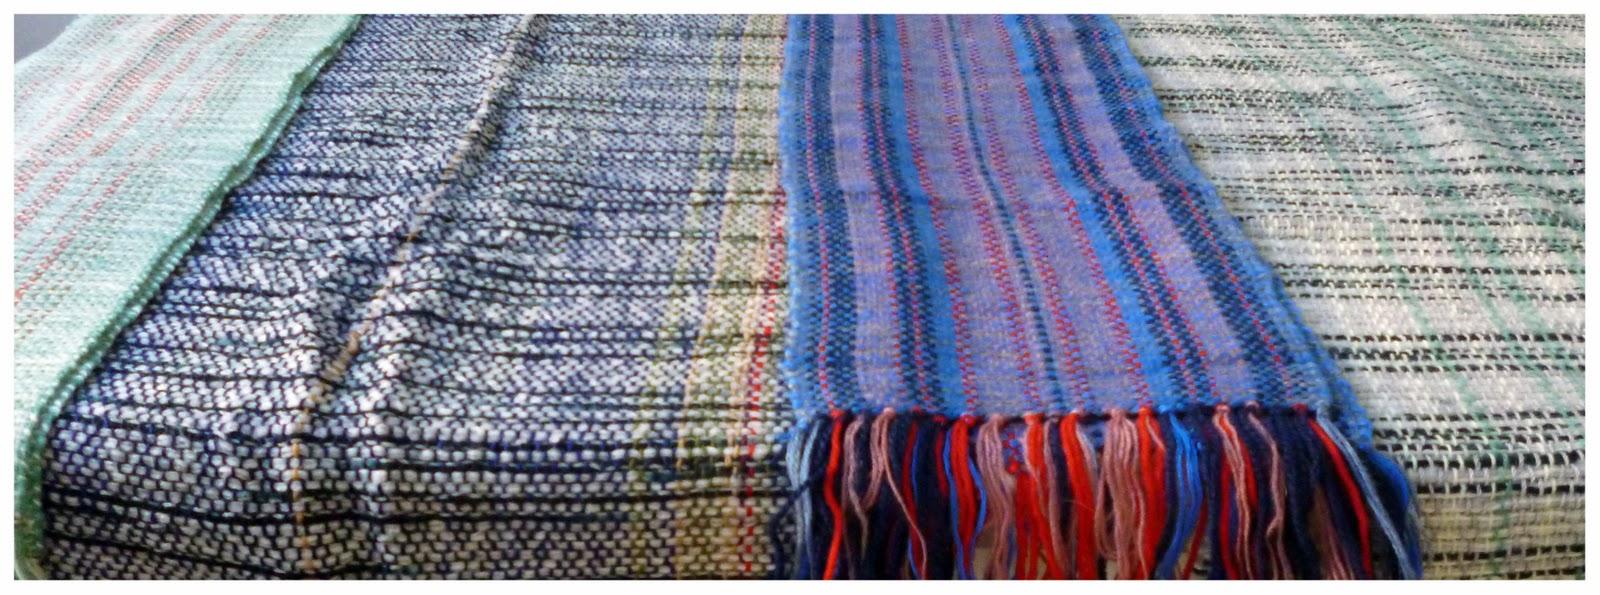 Atelier de colores objetos for Mantas de lana hechas a mano